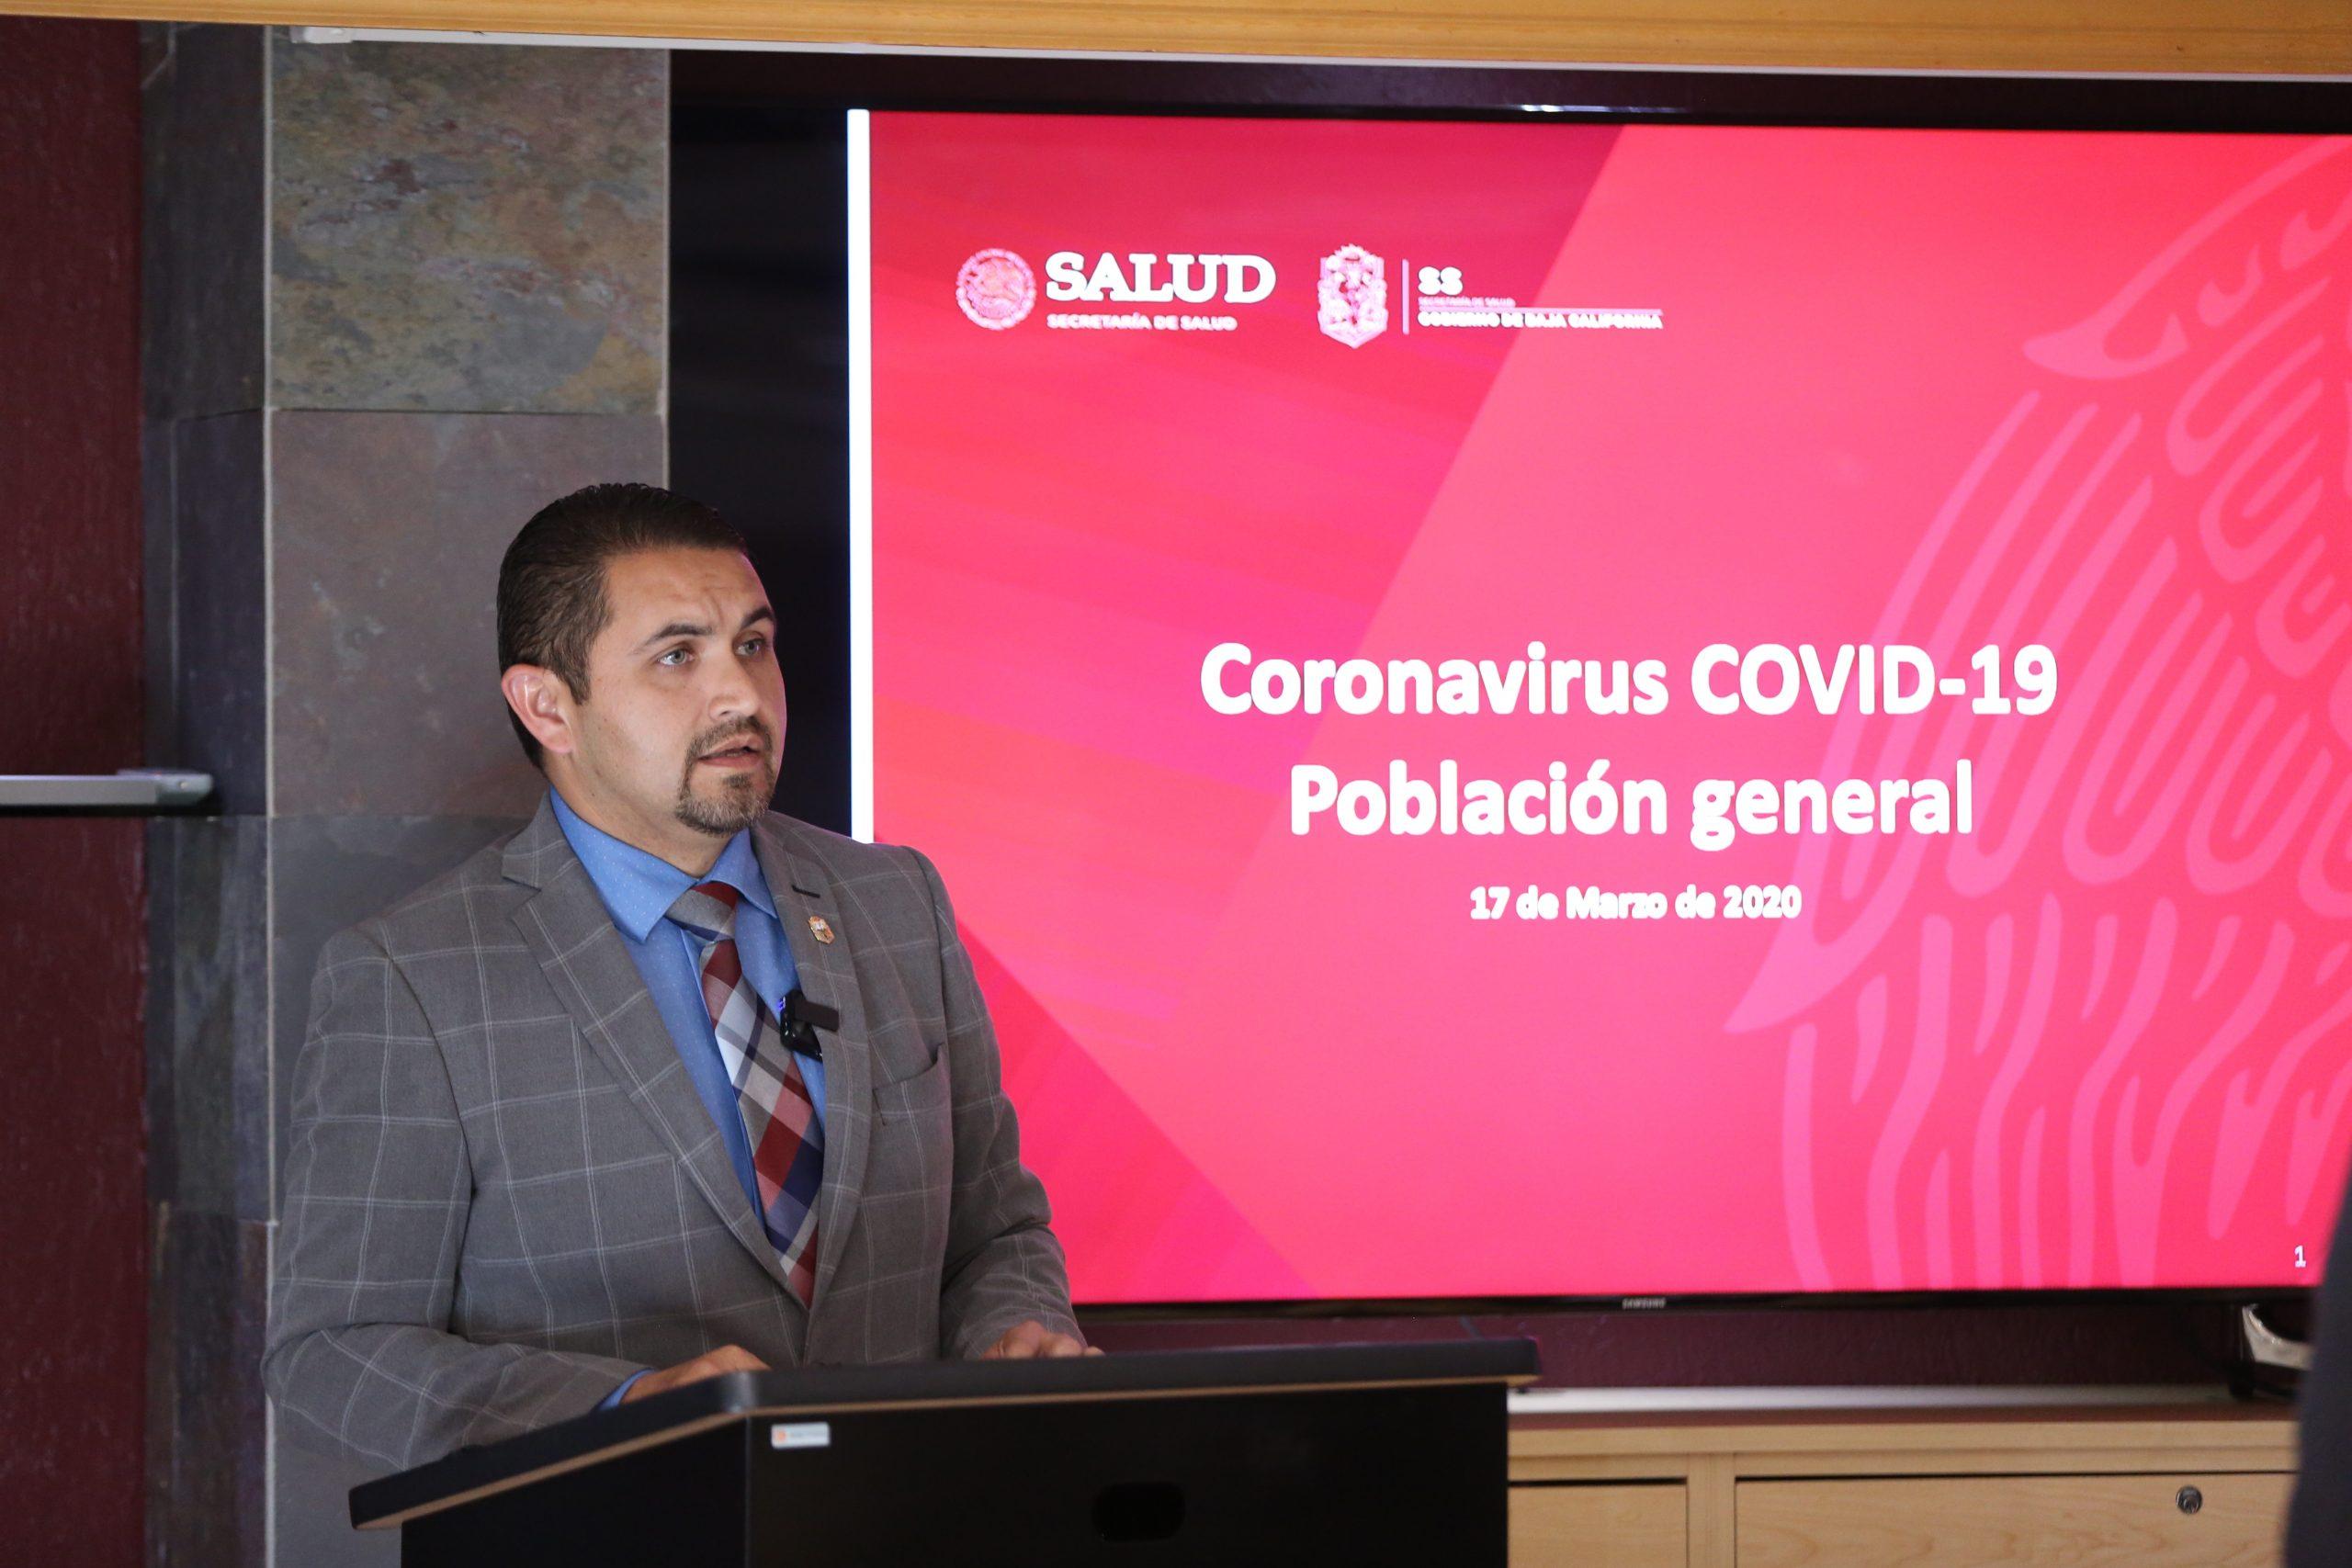 ¡Última hora! Confirman dos primeros casos de coronavirus en Baja California